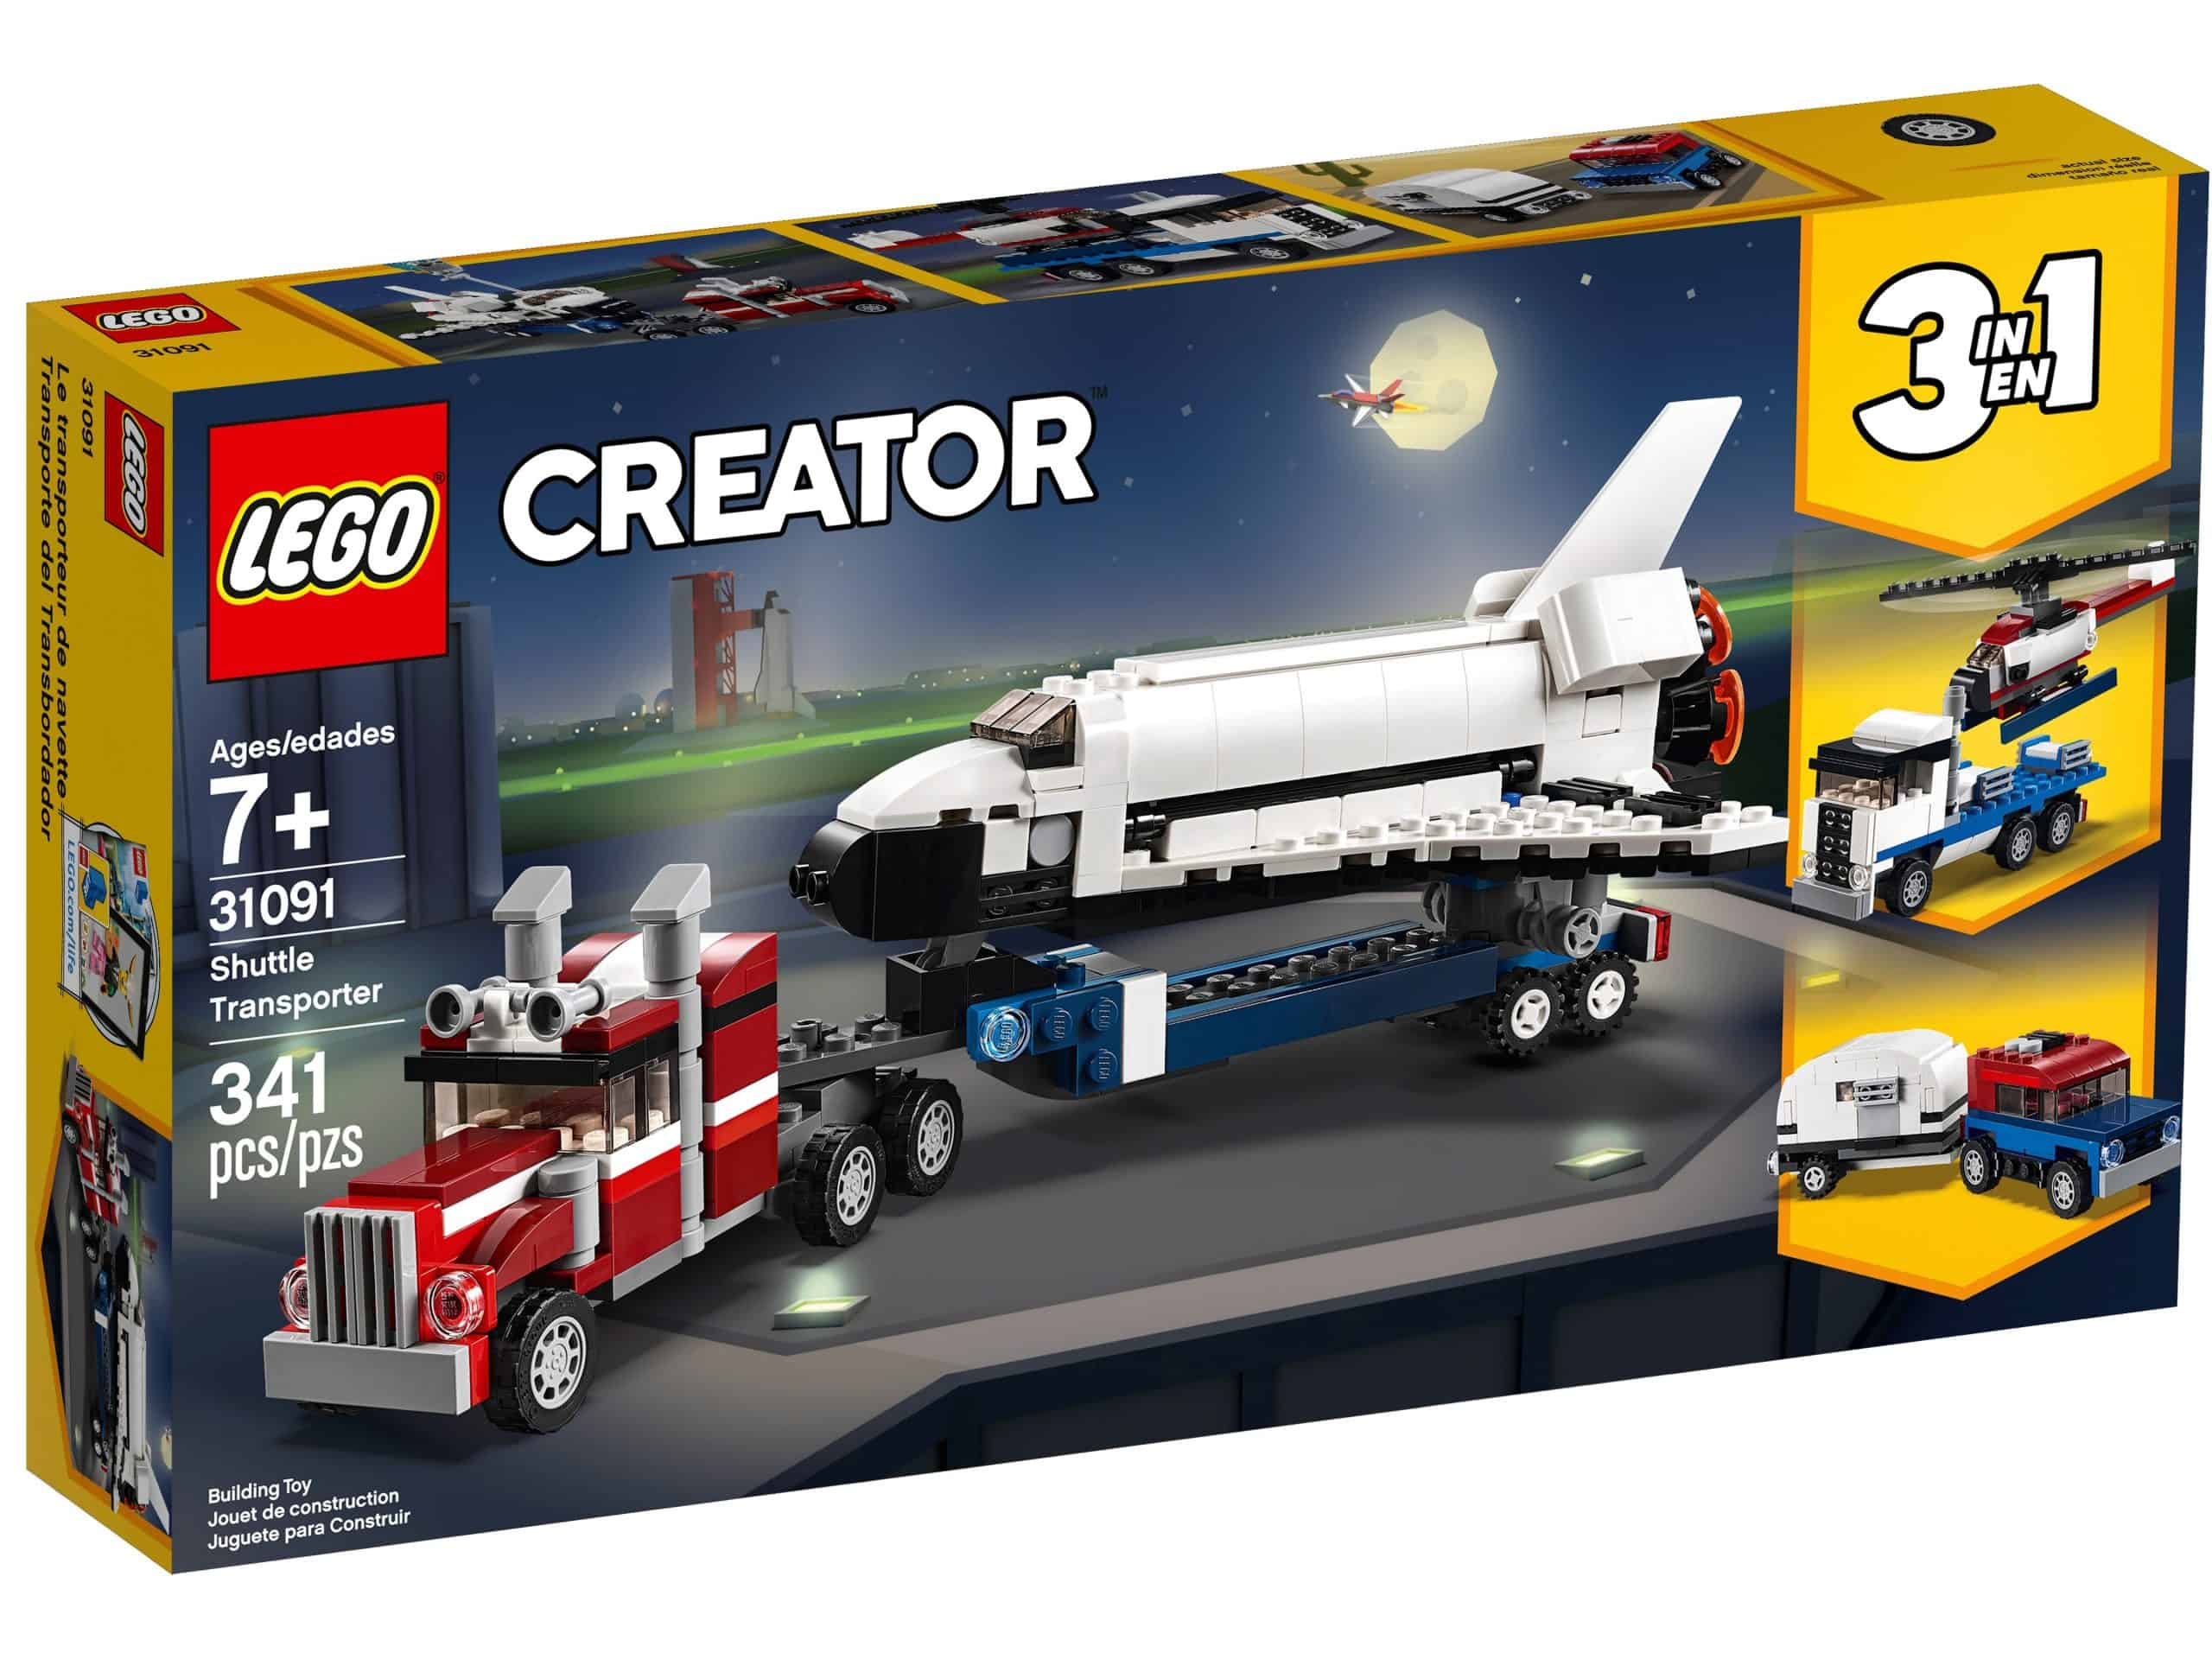 lego 31091 transporter fur space shuttle scaled